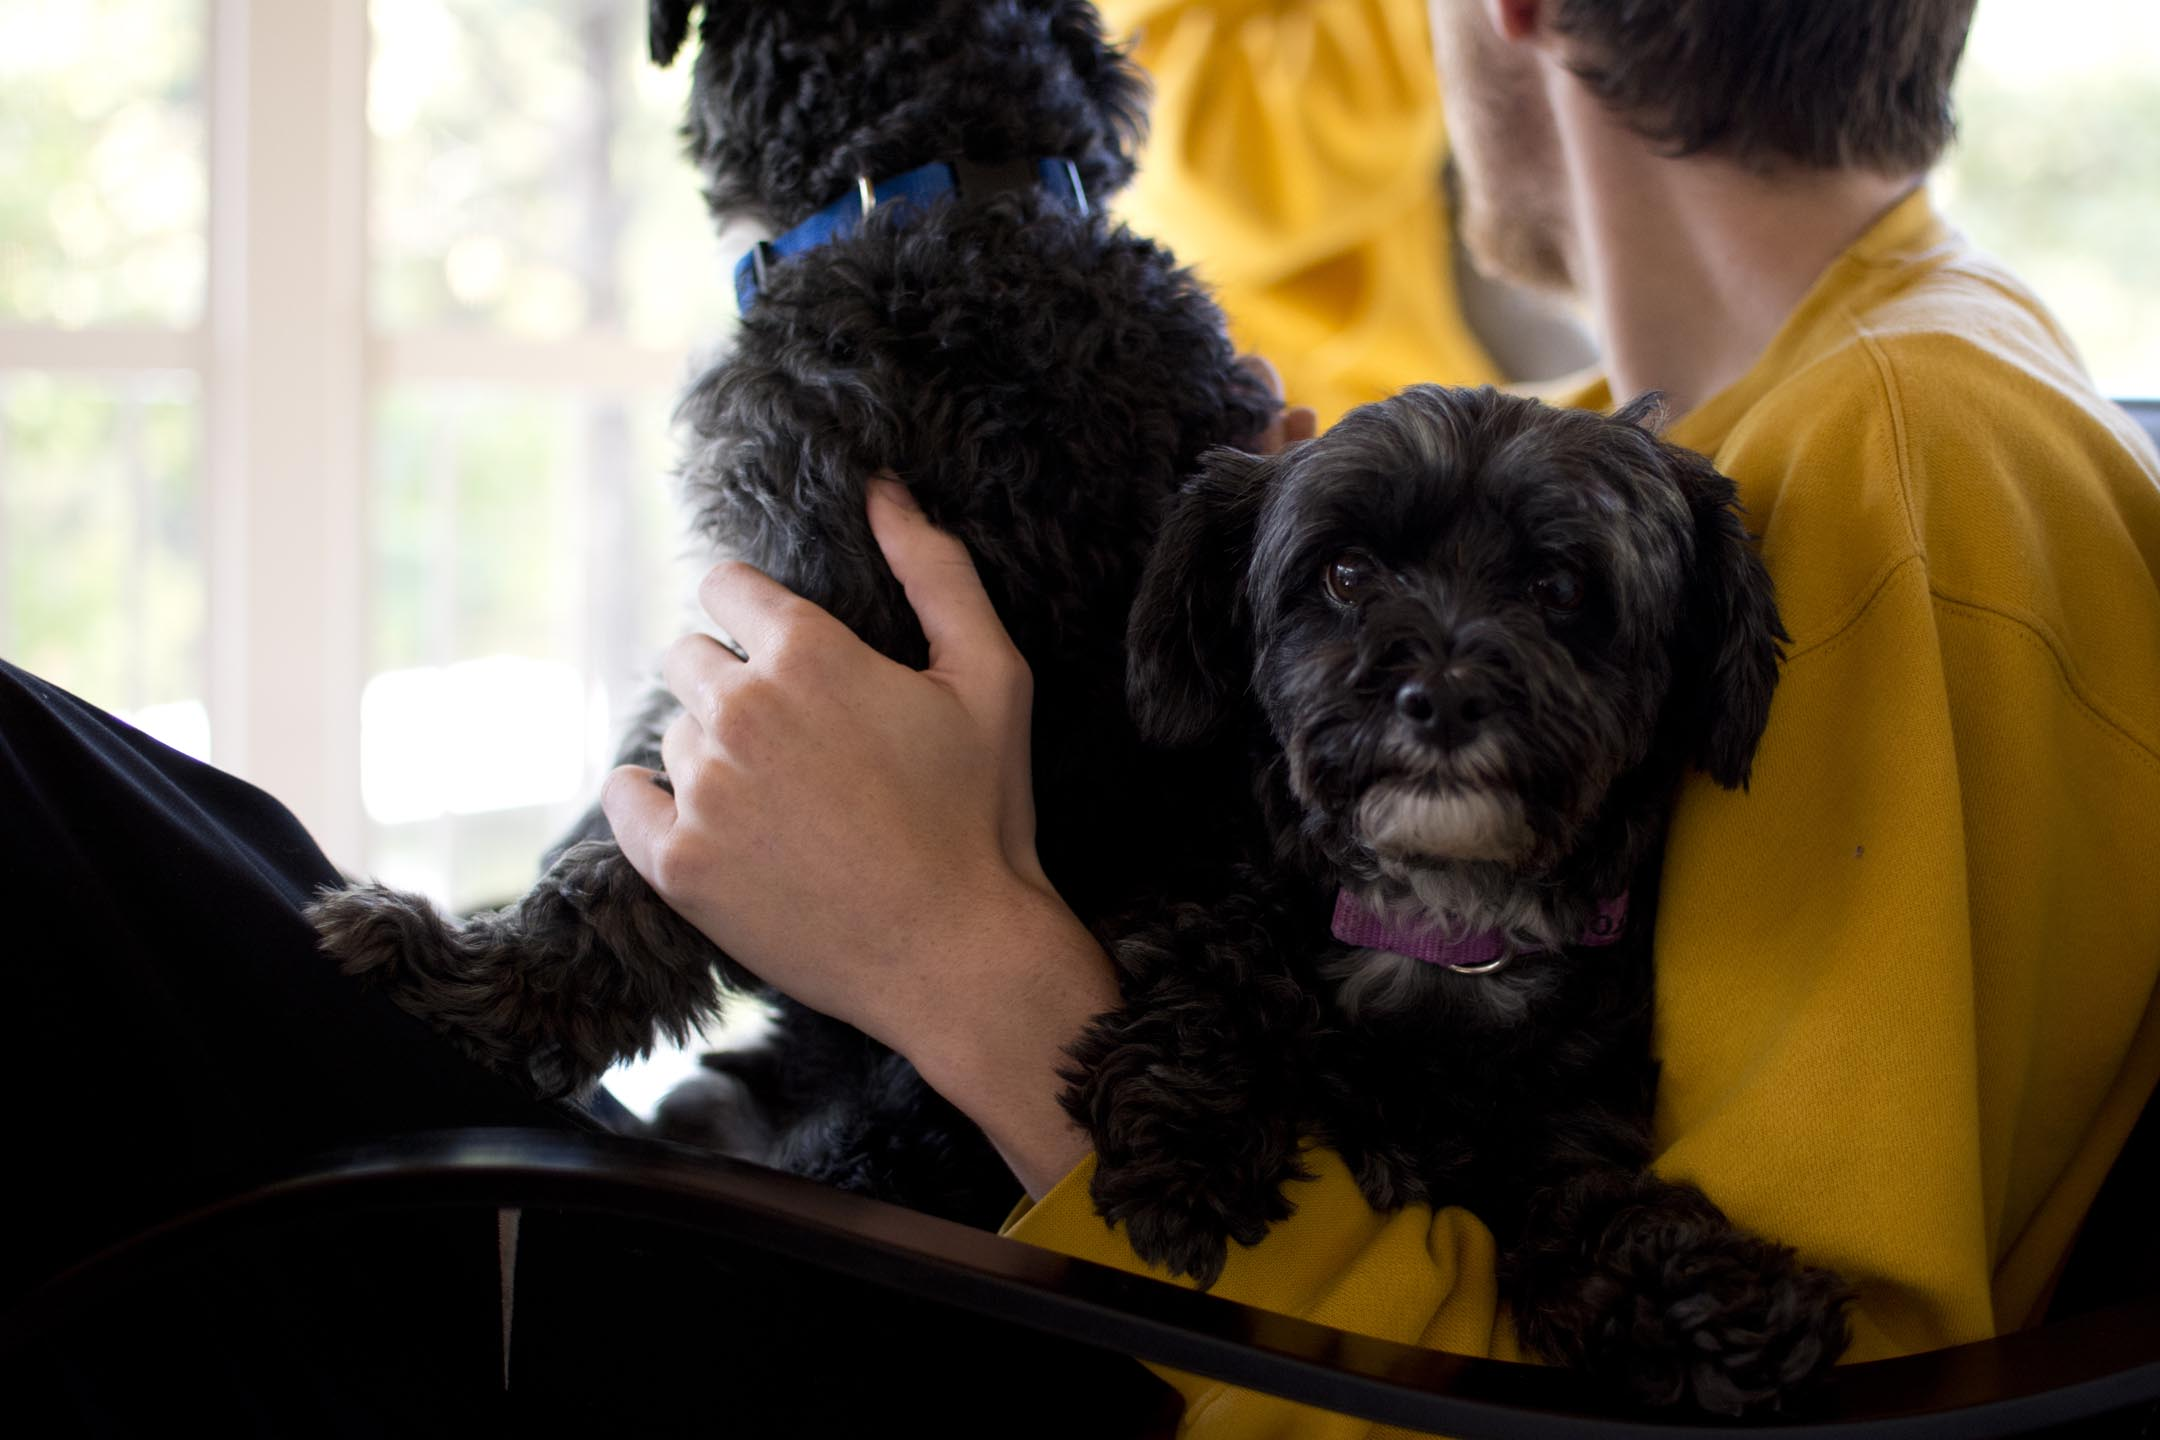 brett+puppies3_lakehouse_10-10-15.jpg